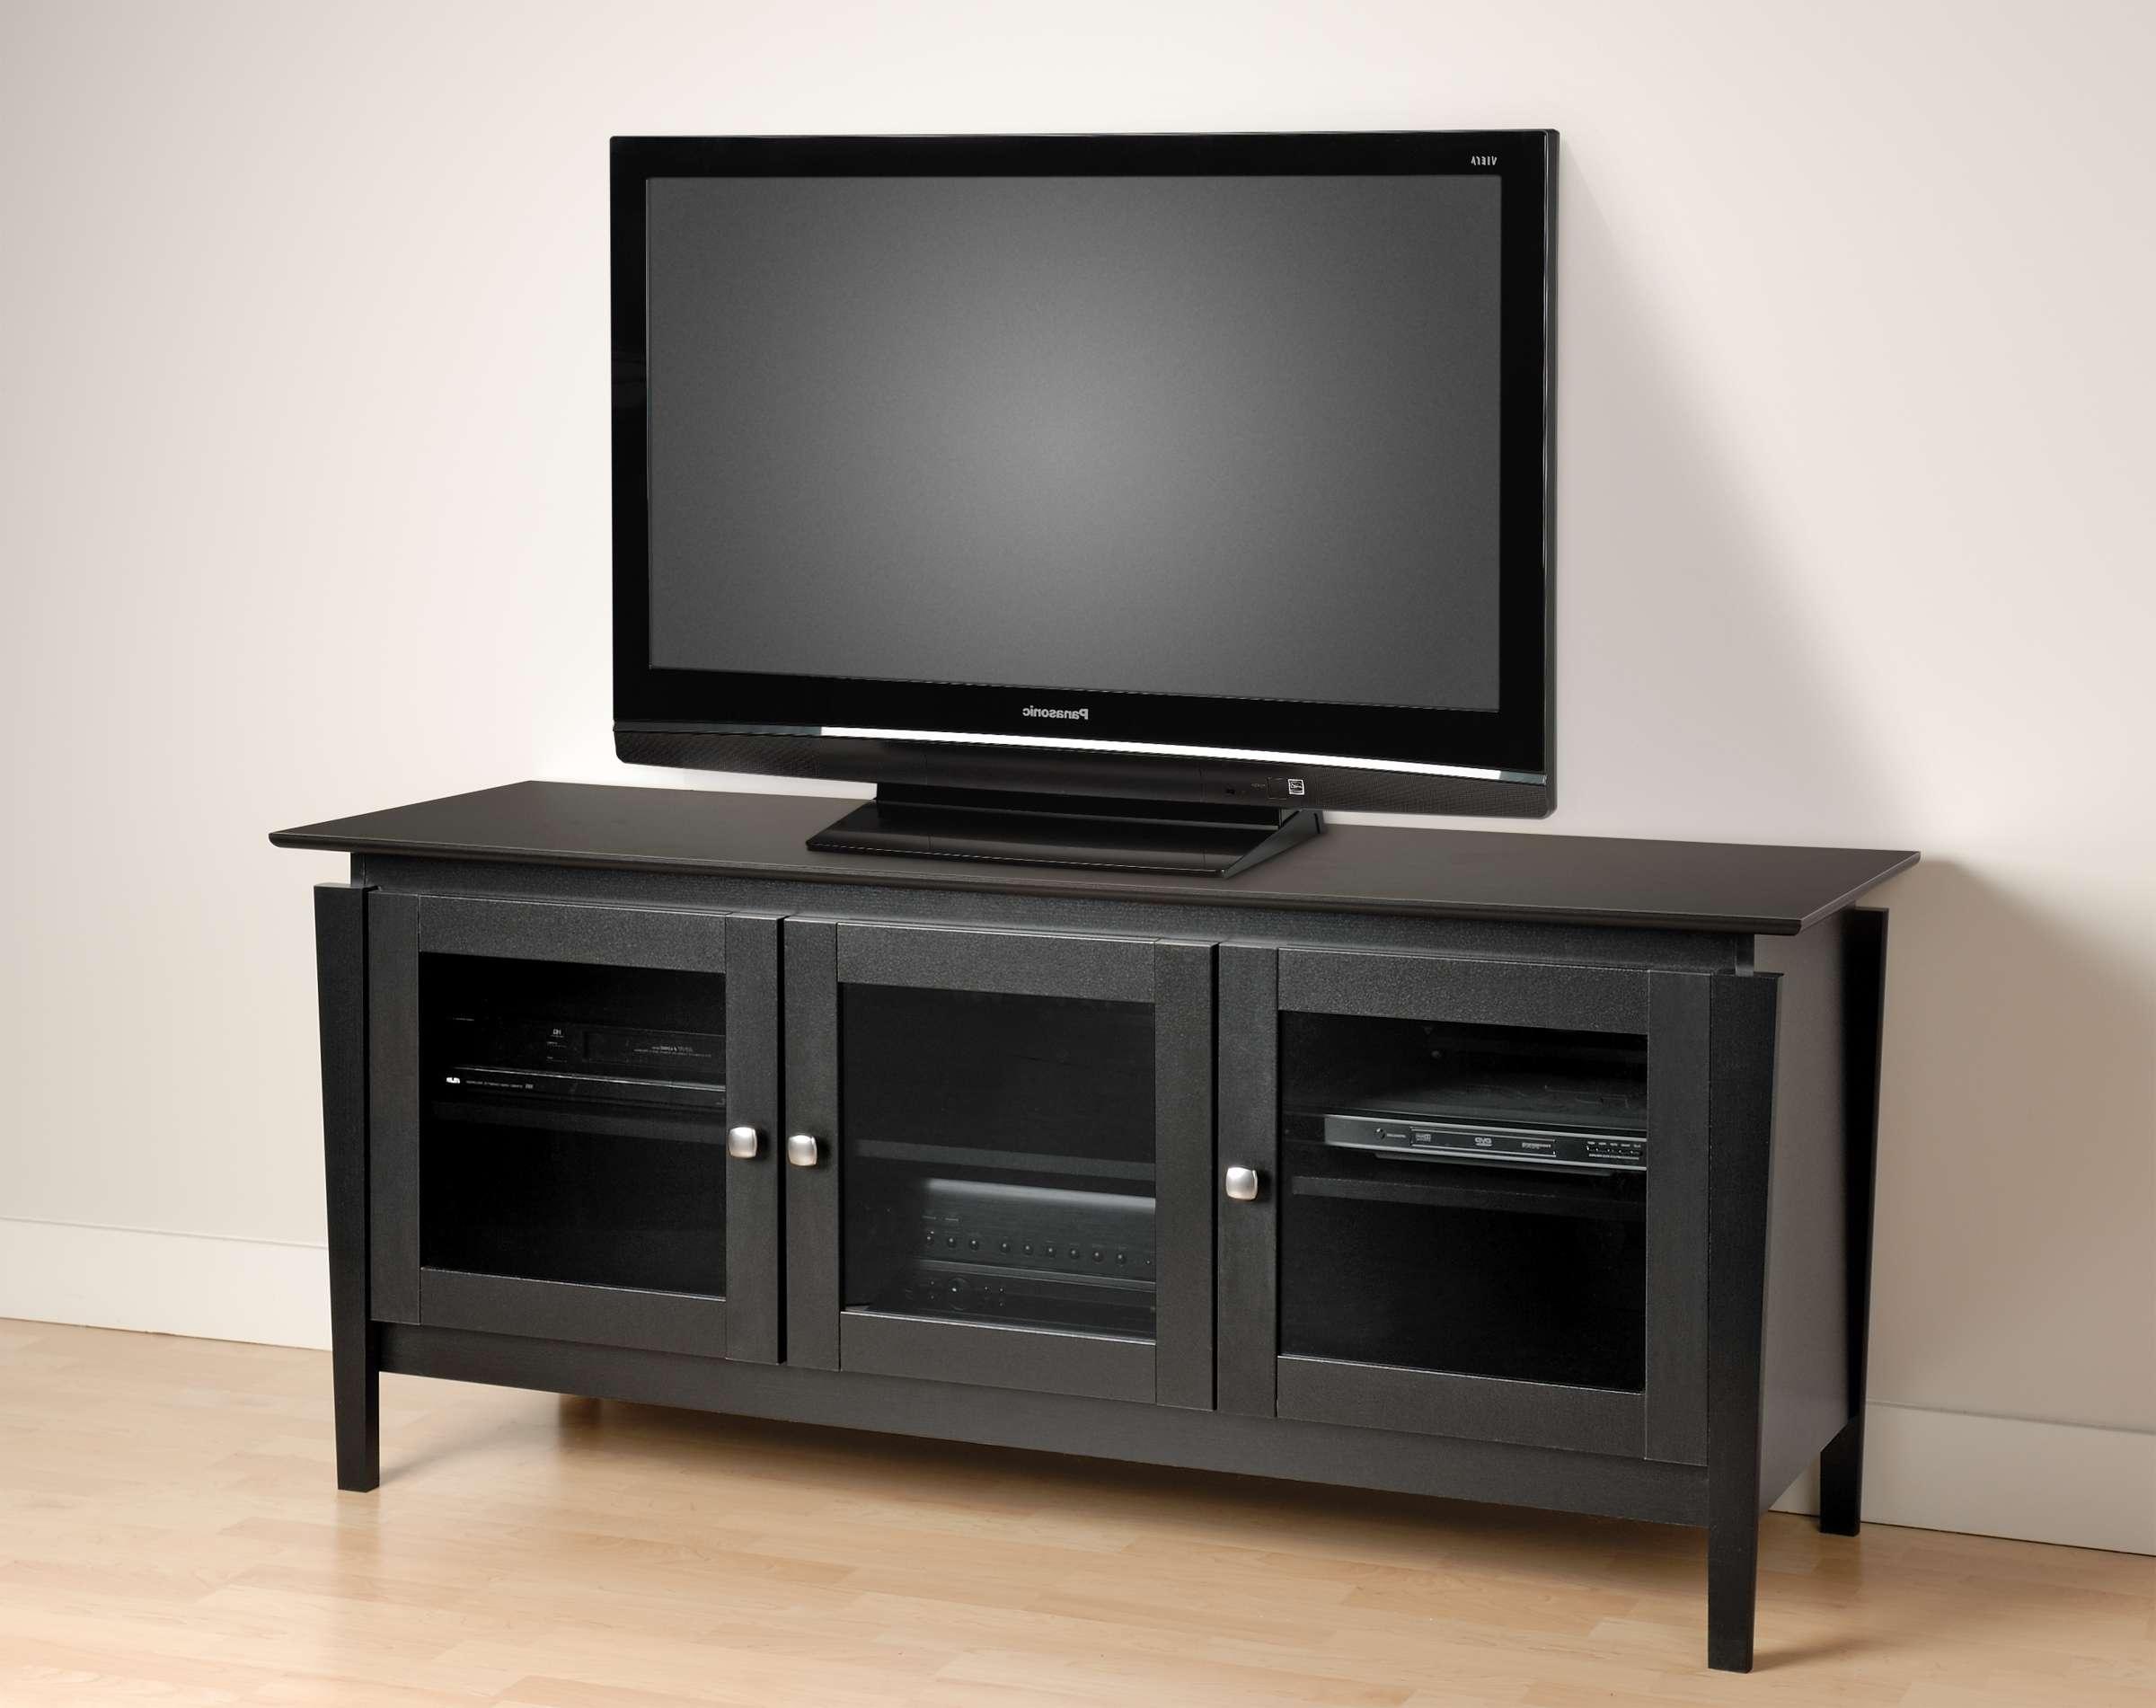 Tv Cabinet With Glass Doors – Imanisr Inside Corner Tv Cabinets With Glass Doors (View 18 of 20)